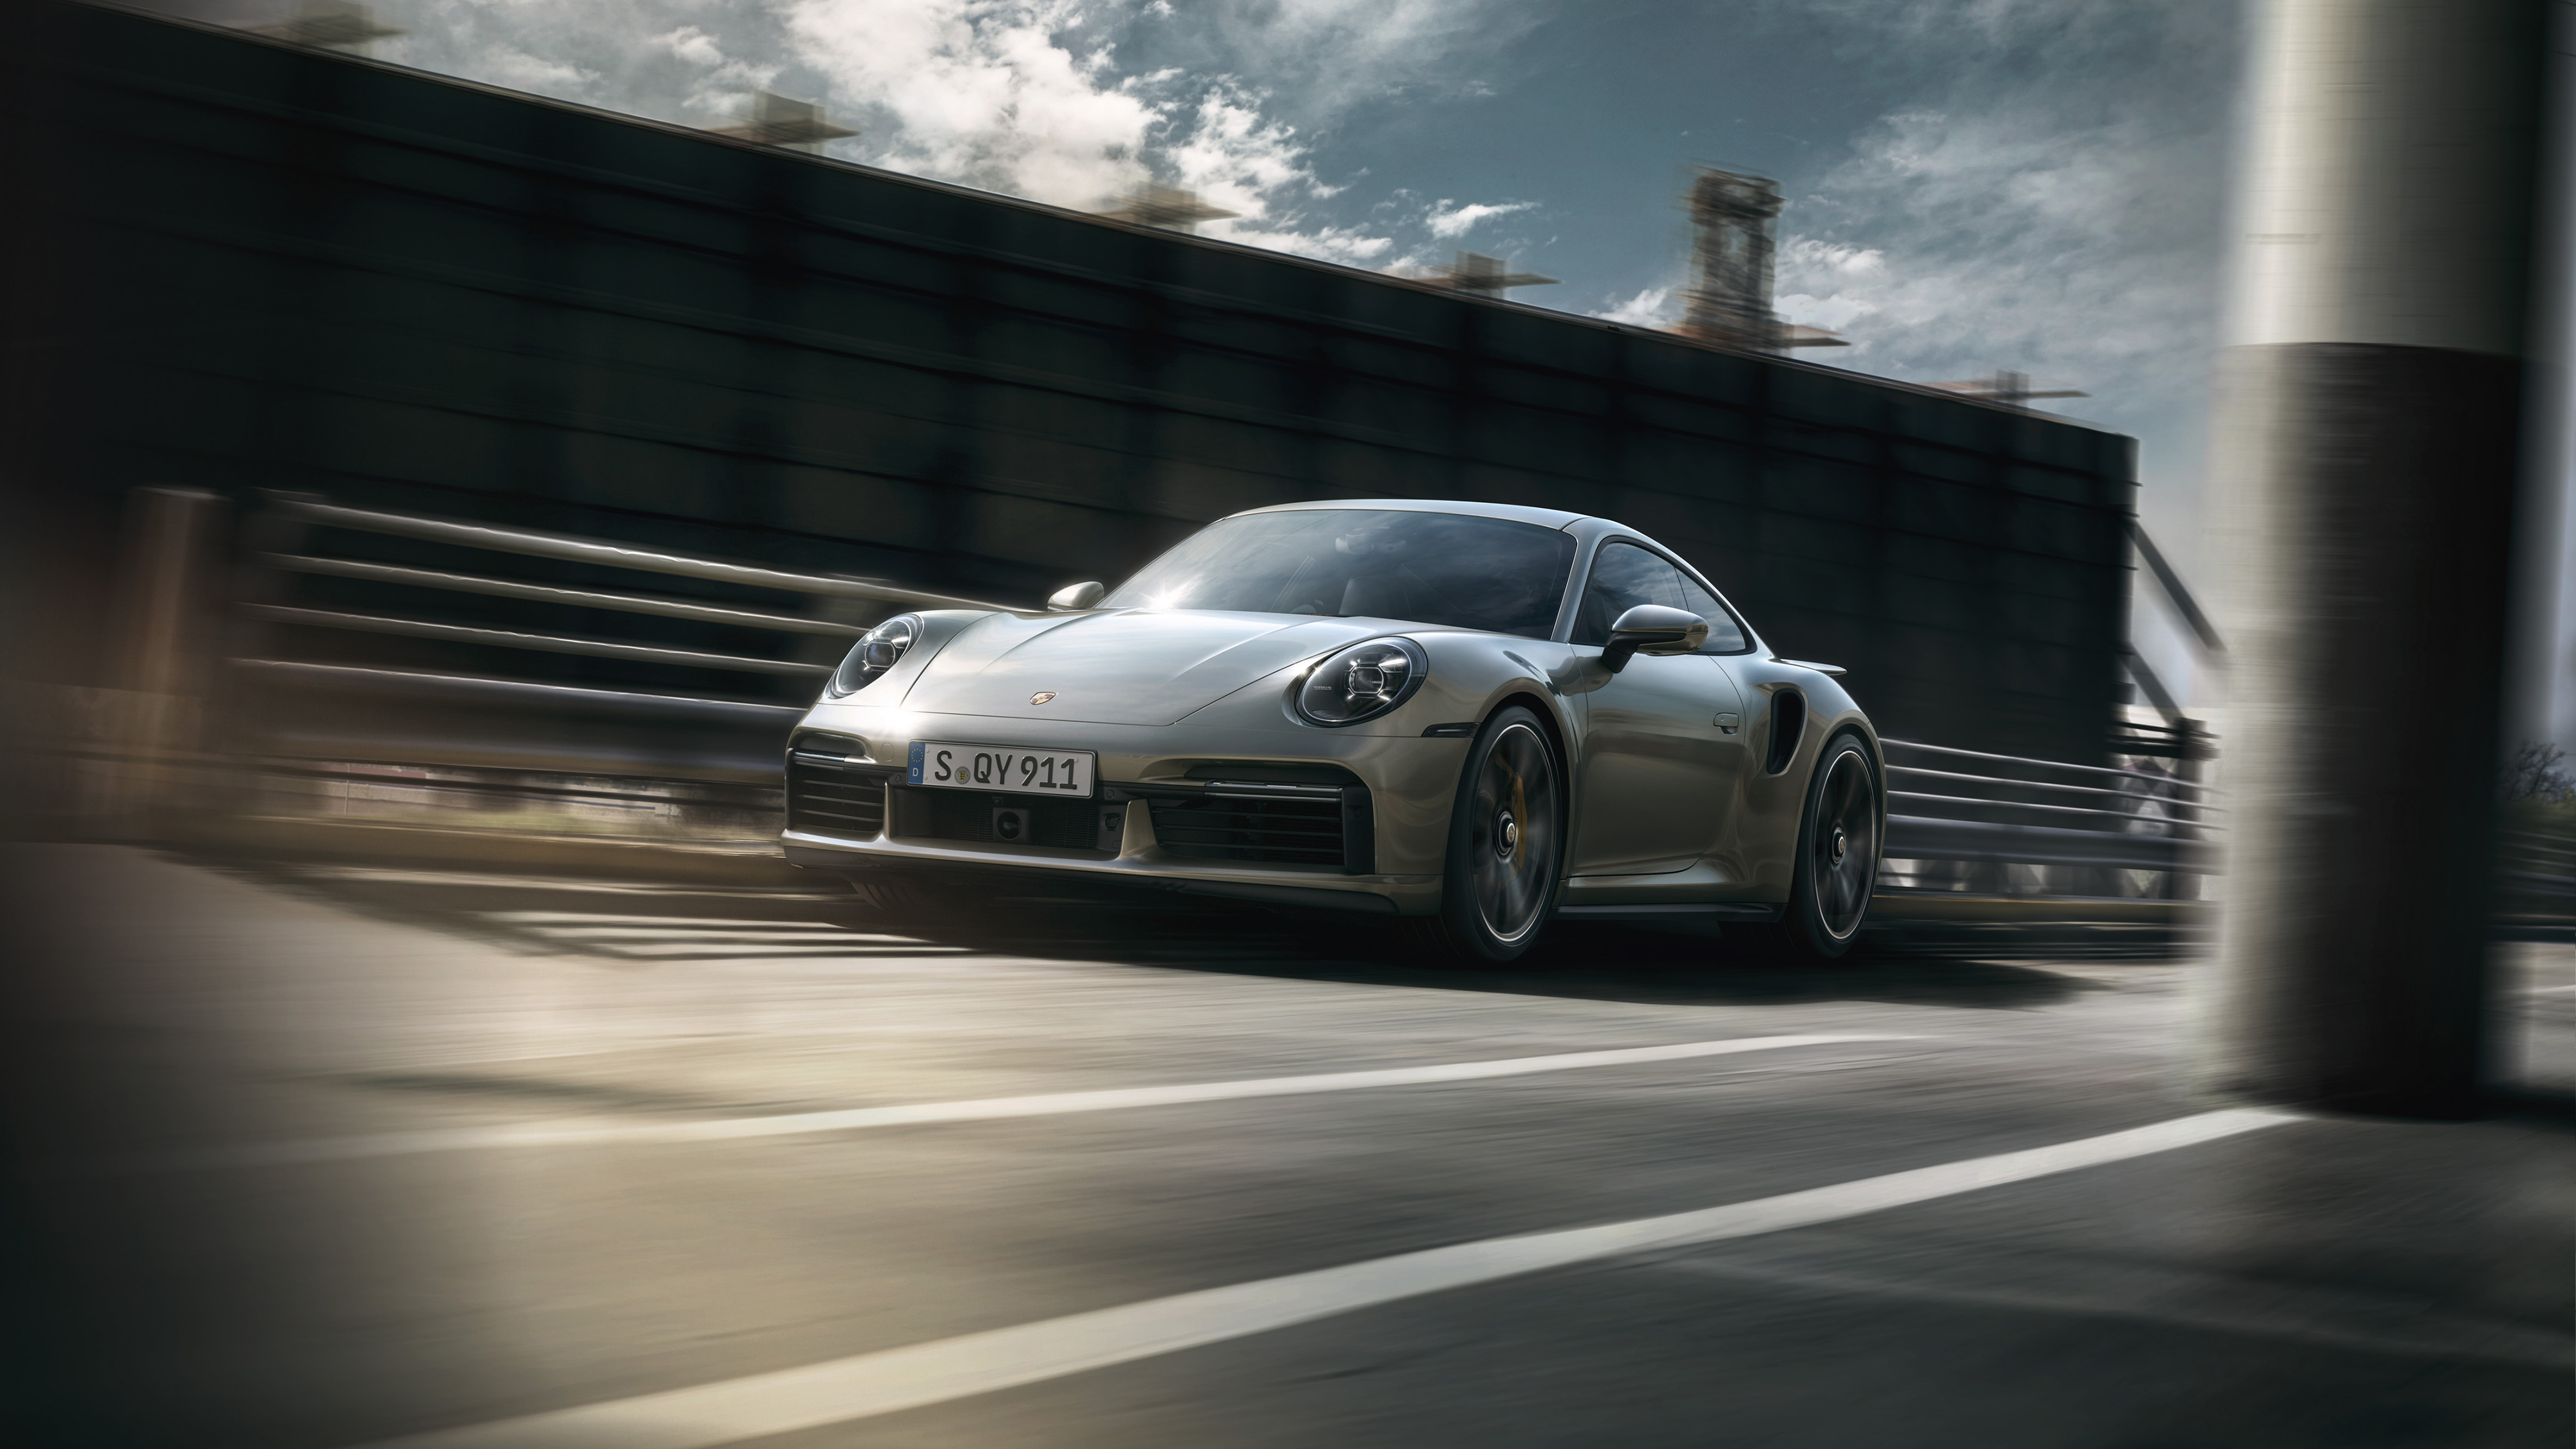 Porsche 911 Turbo S 2020 5k 5 Wallpaper Hd Car Wallpapers Id 14583